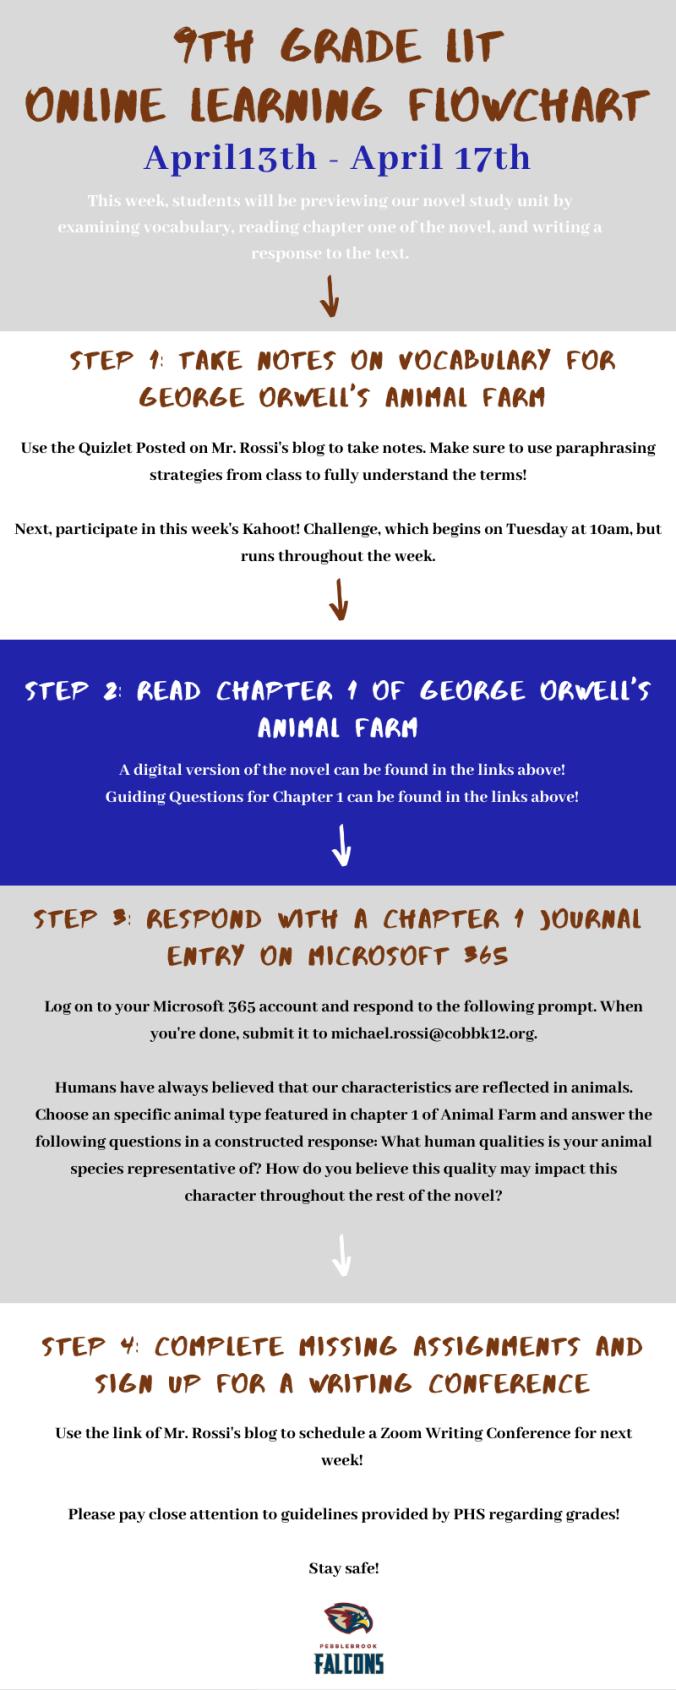 Copy of Online Learning FlowChart (3)